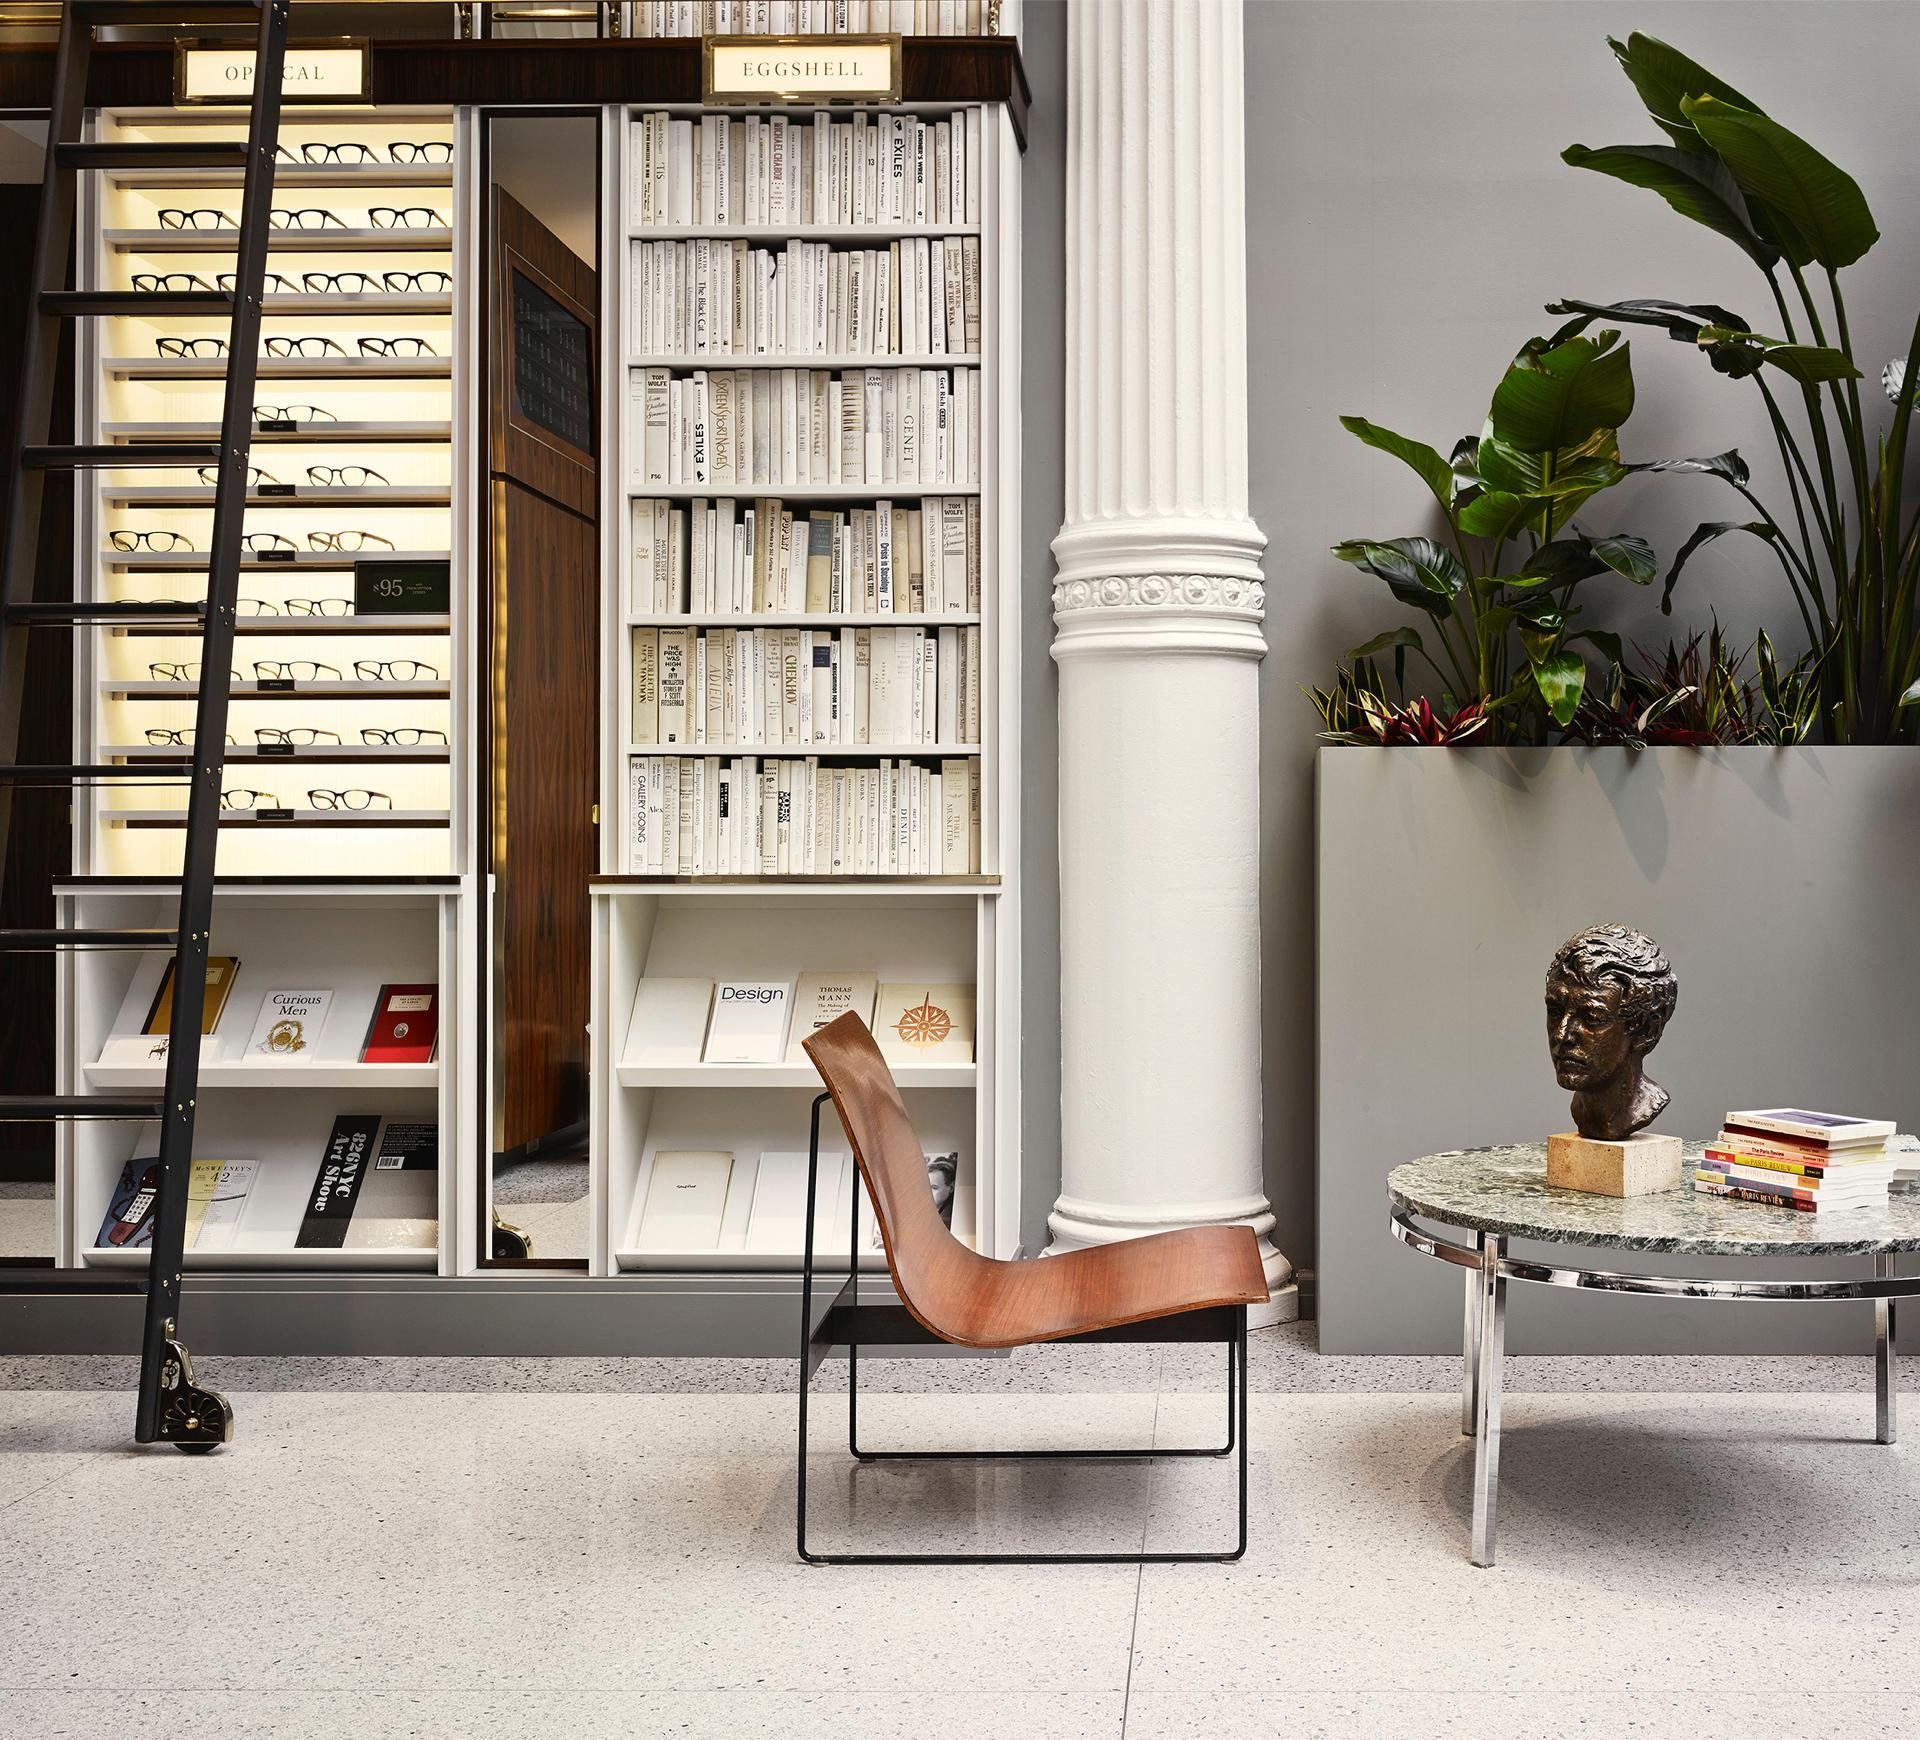 Washington St Warby Parker